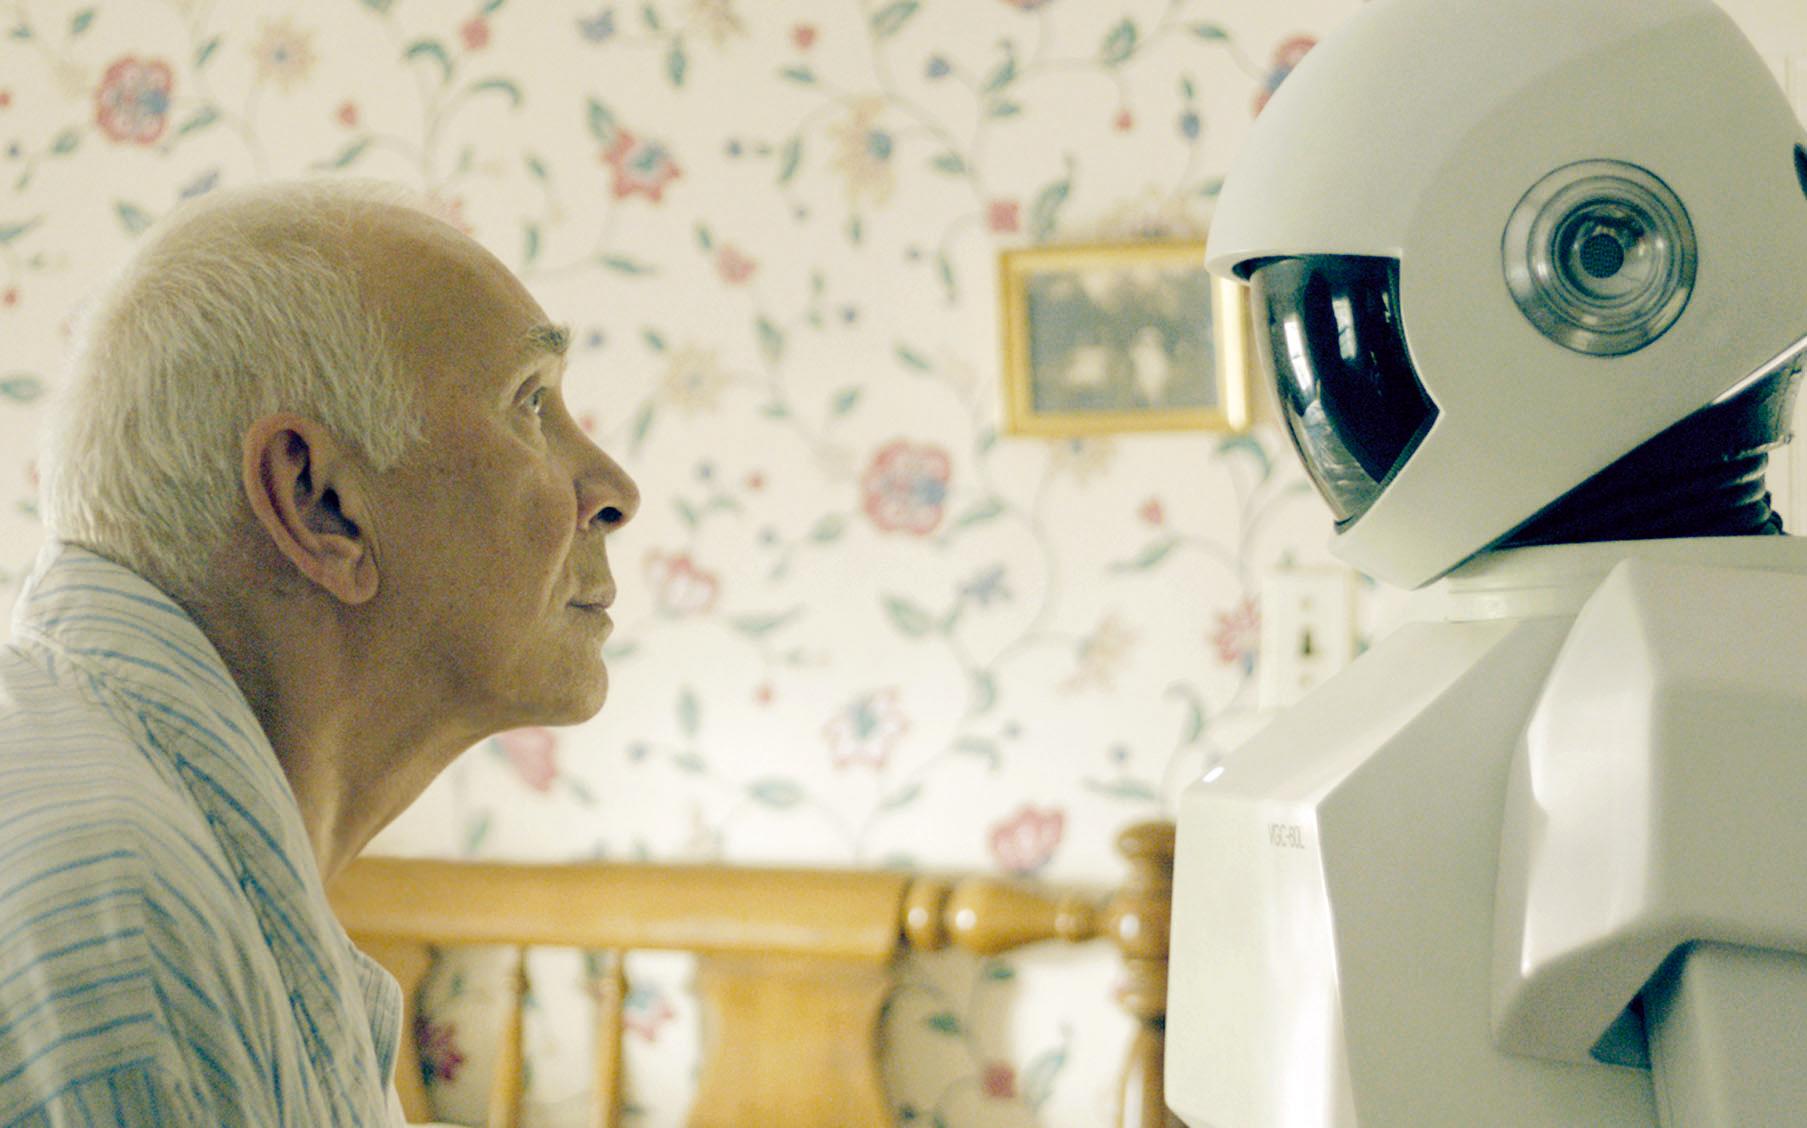 Frank Langella, James Marsden, Liv Tyler, Jeremy Sisto, and Susan Sarandon star in Robot & Frank now playing in Dallas.